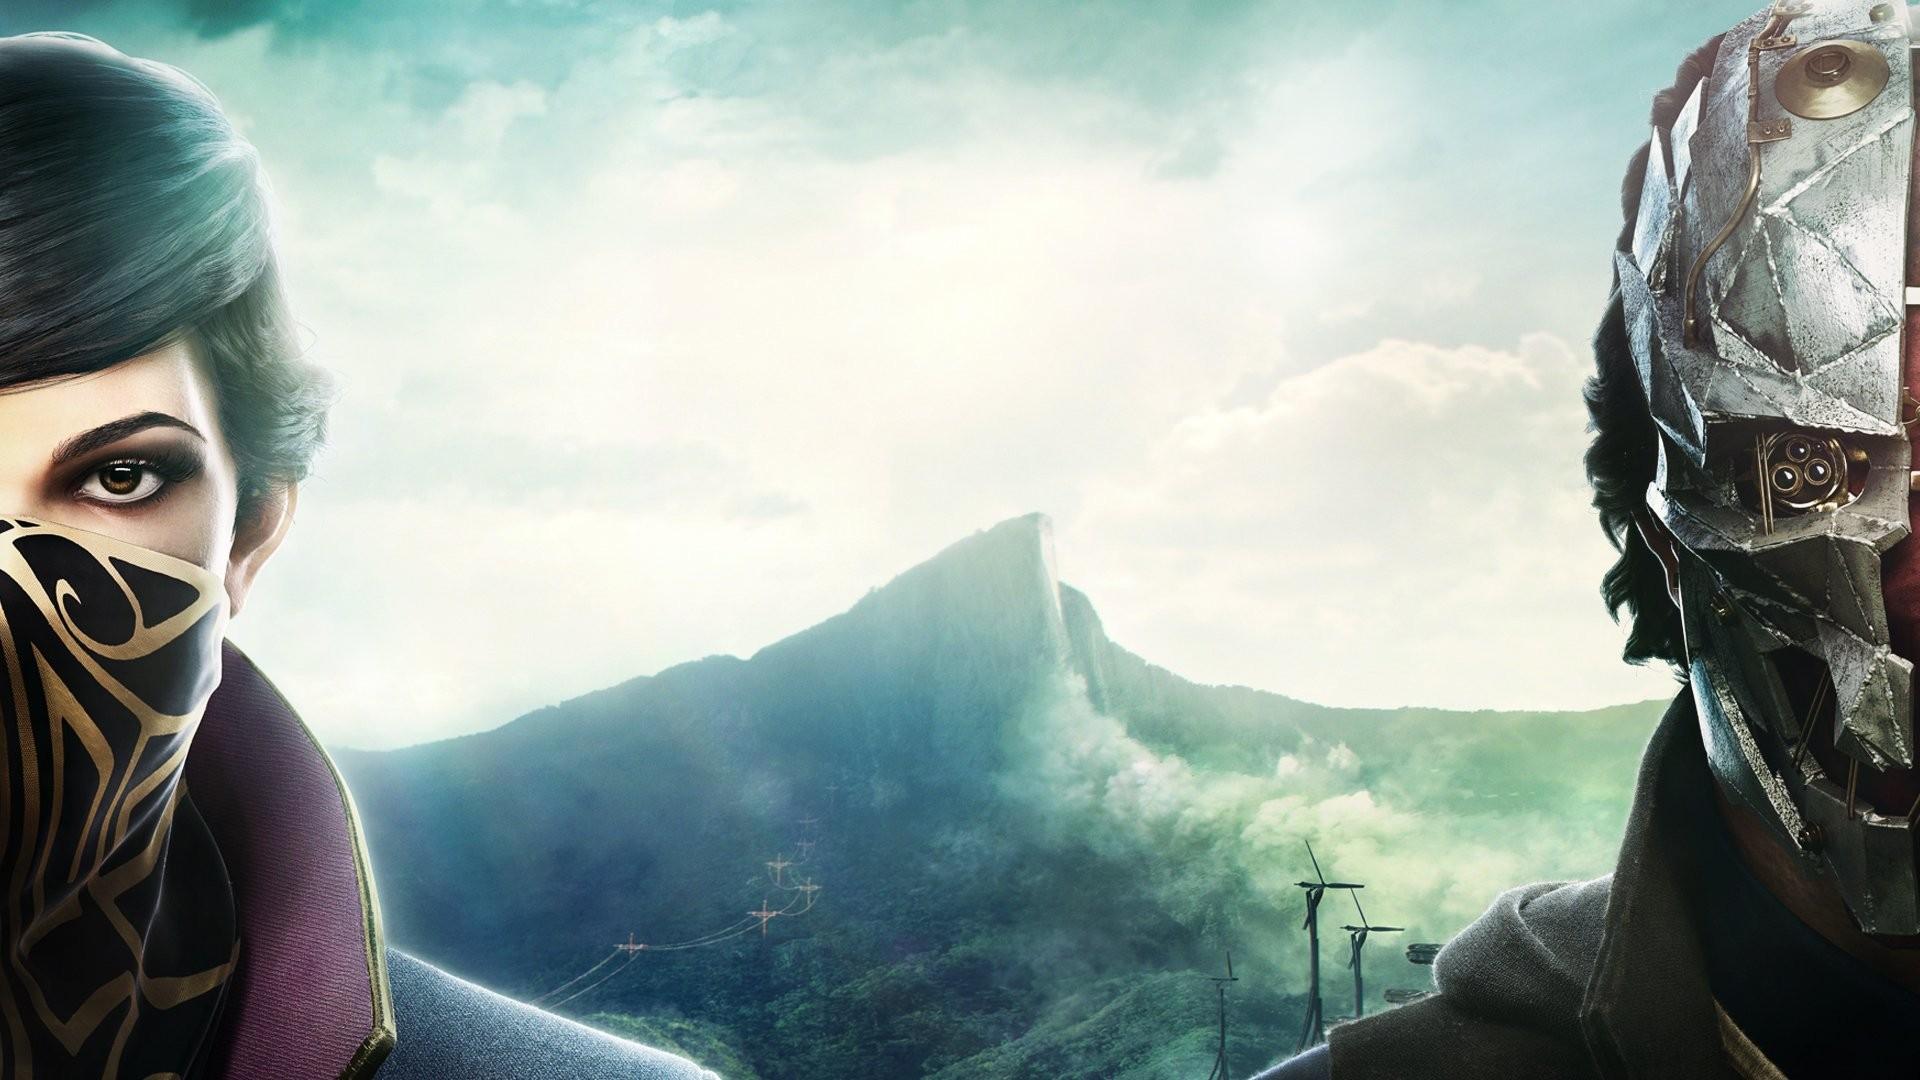 Dishonored 2 Wallpaper ① Download Free Beautiful Full Hd